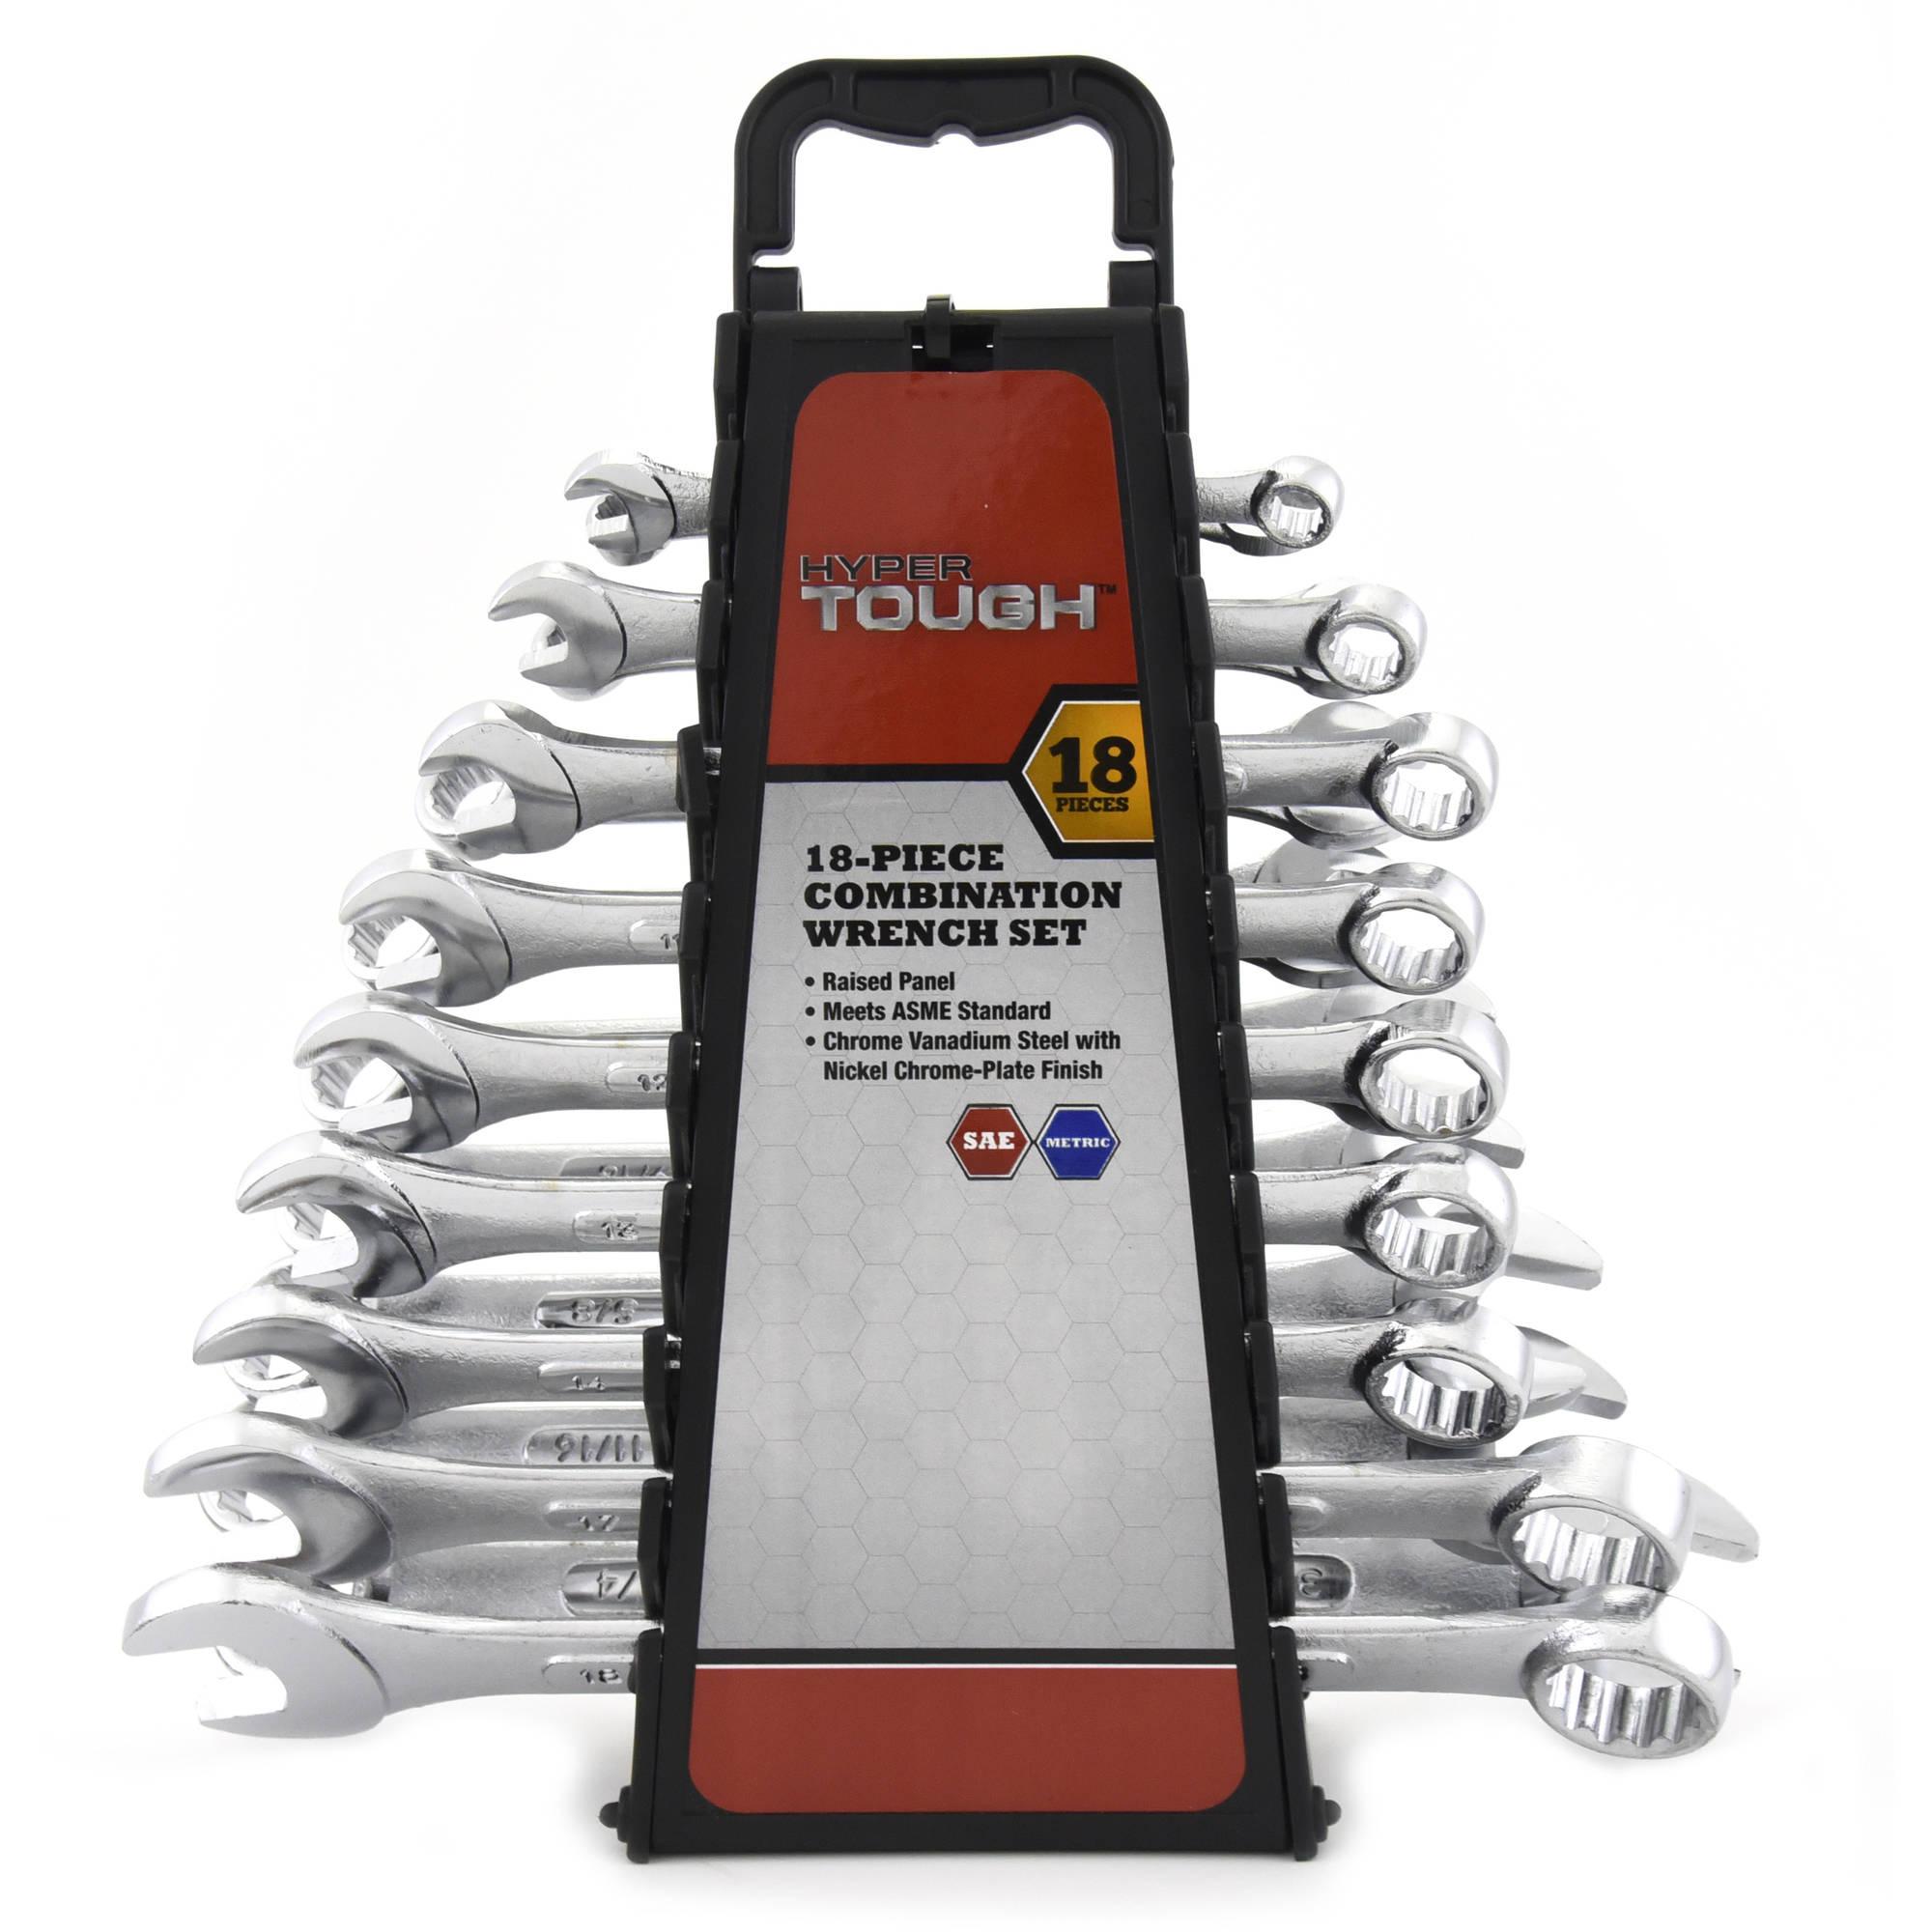 Hyper Tough 18-Piece Combination Wrench Set $10.00